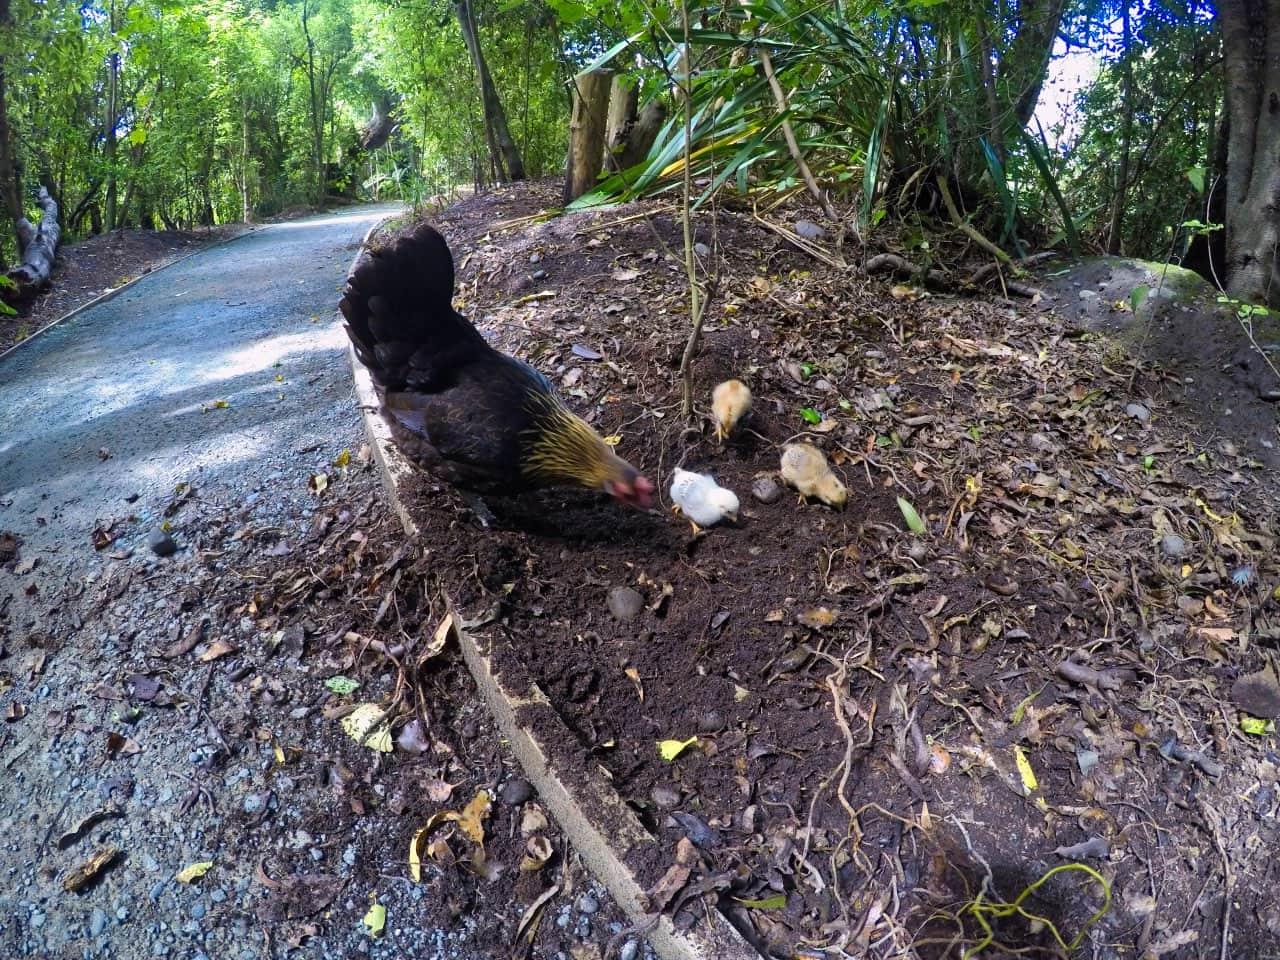 Willowbank-Wildlife-PArk-Chistchurch-chicken-with-kids